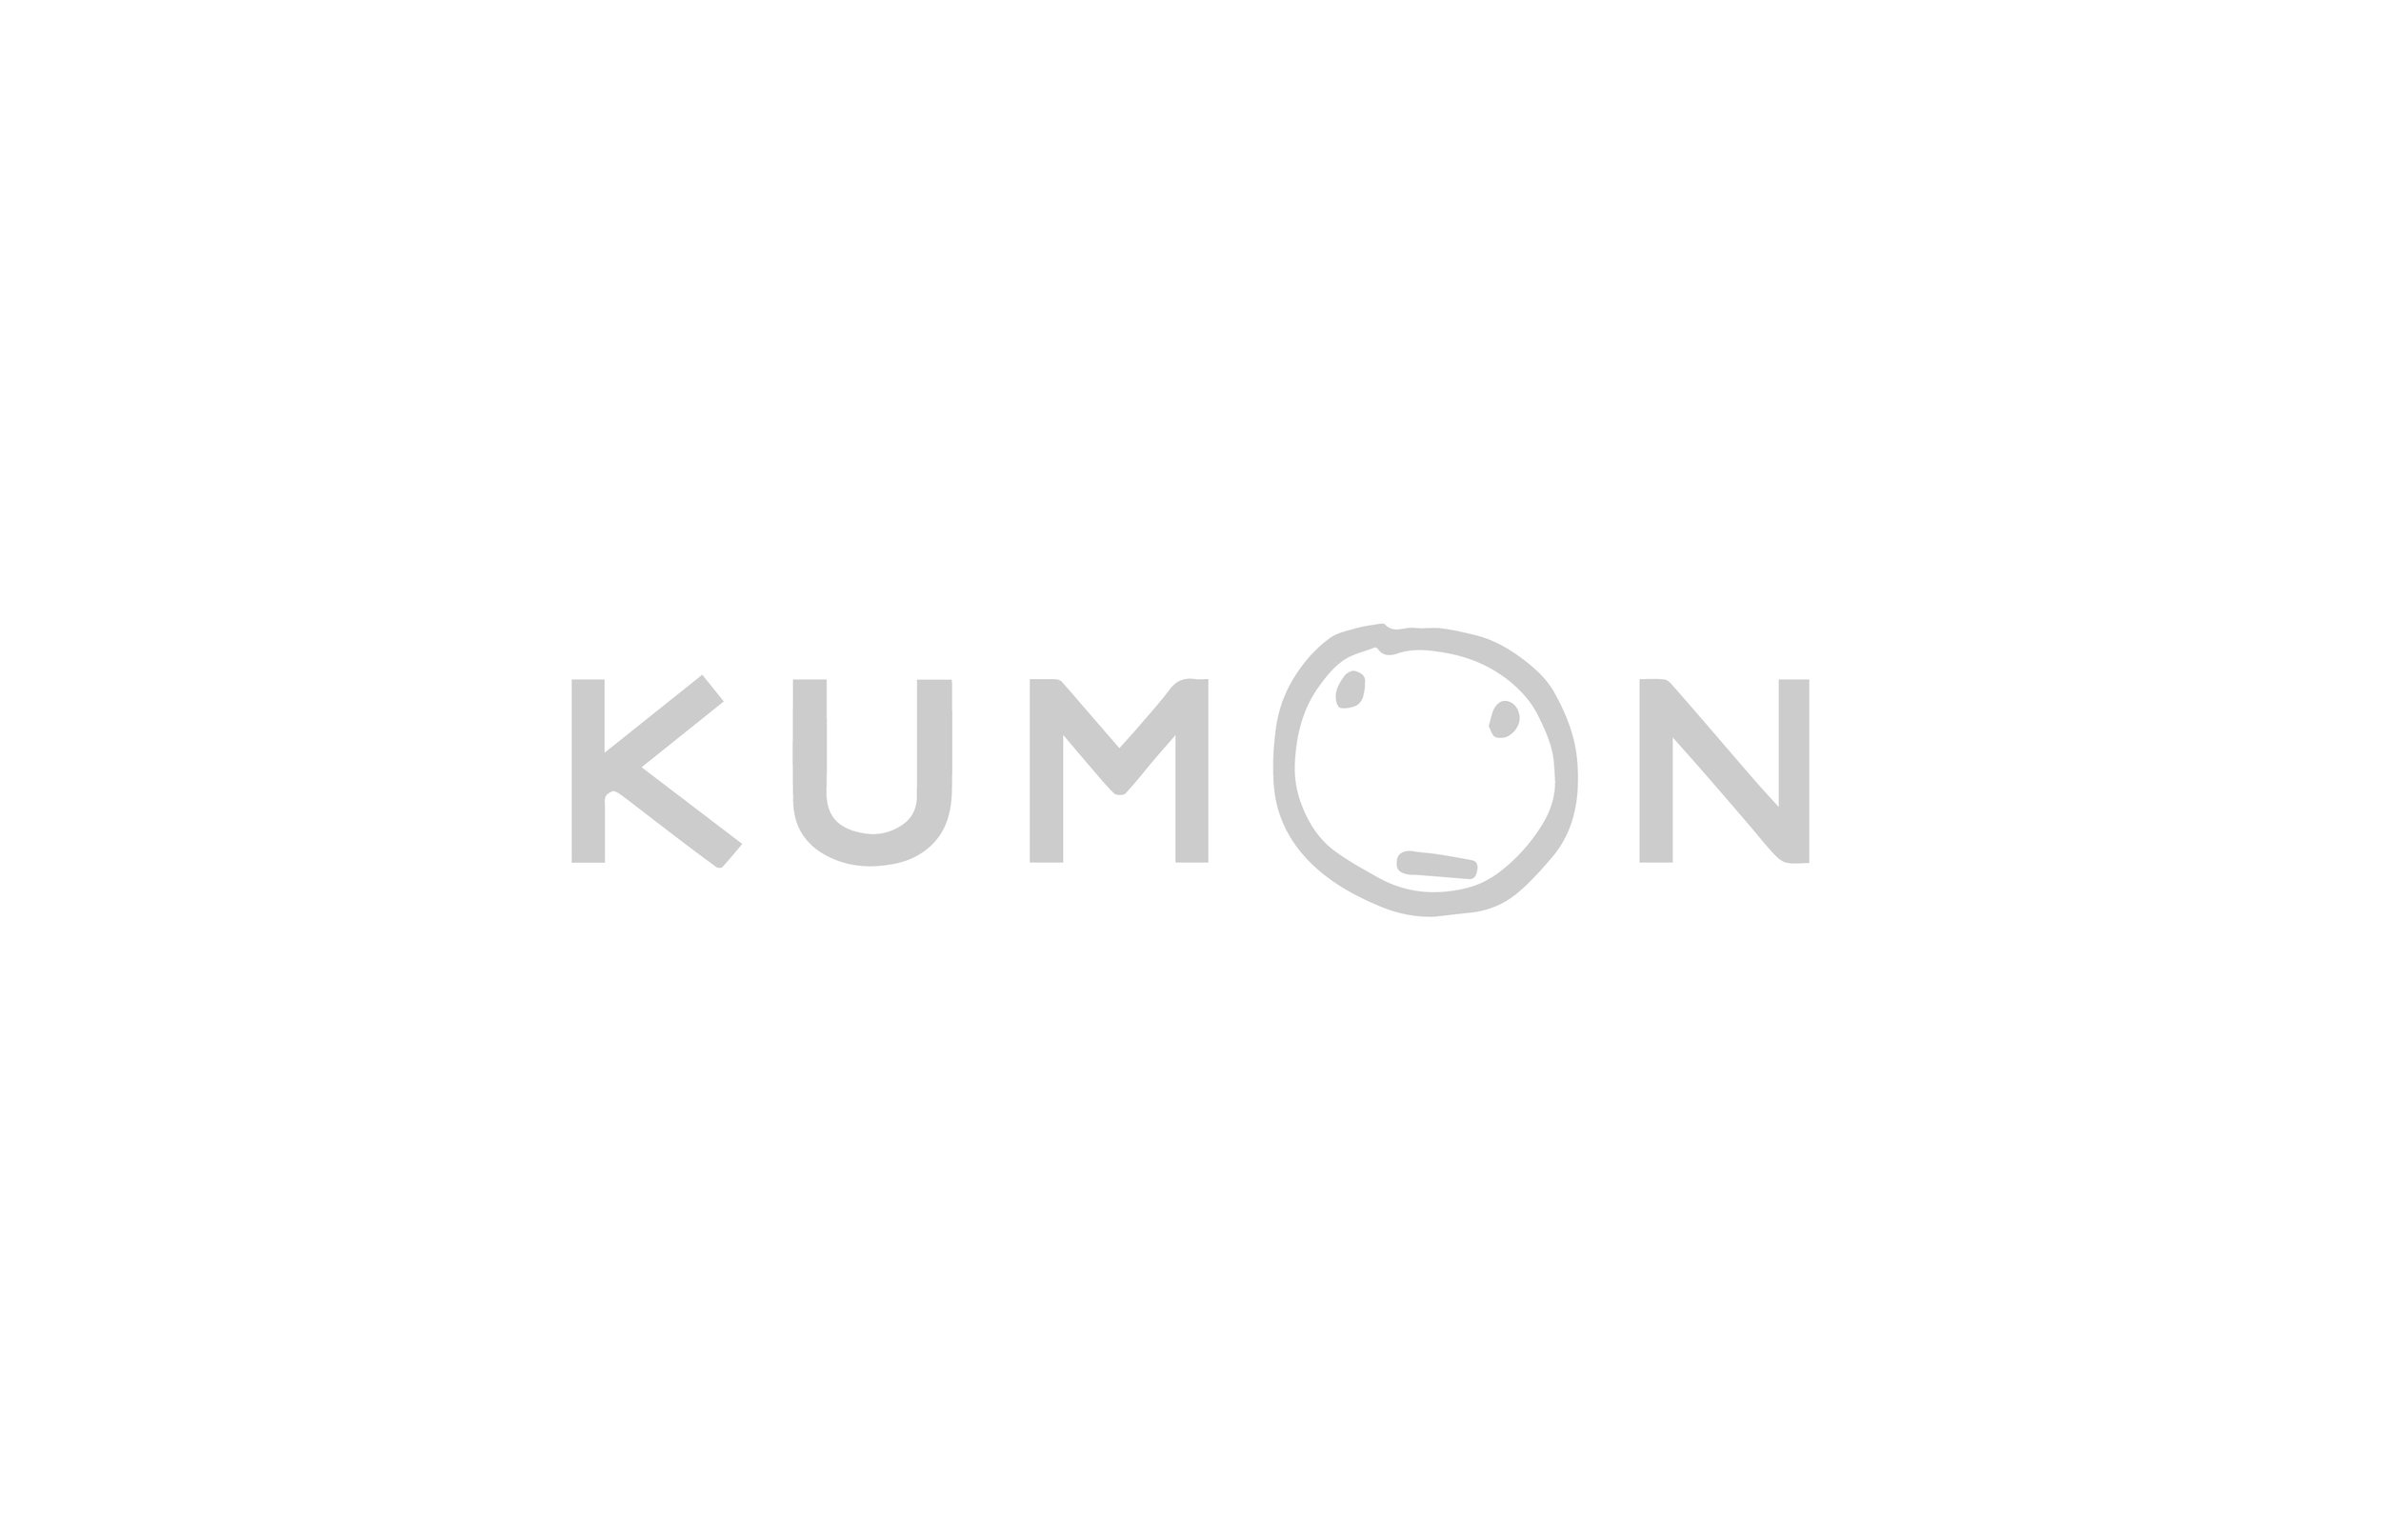 logos-07.jpg